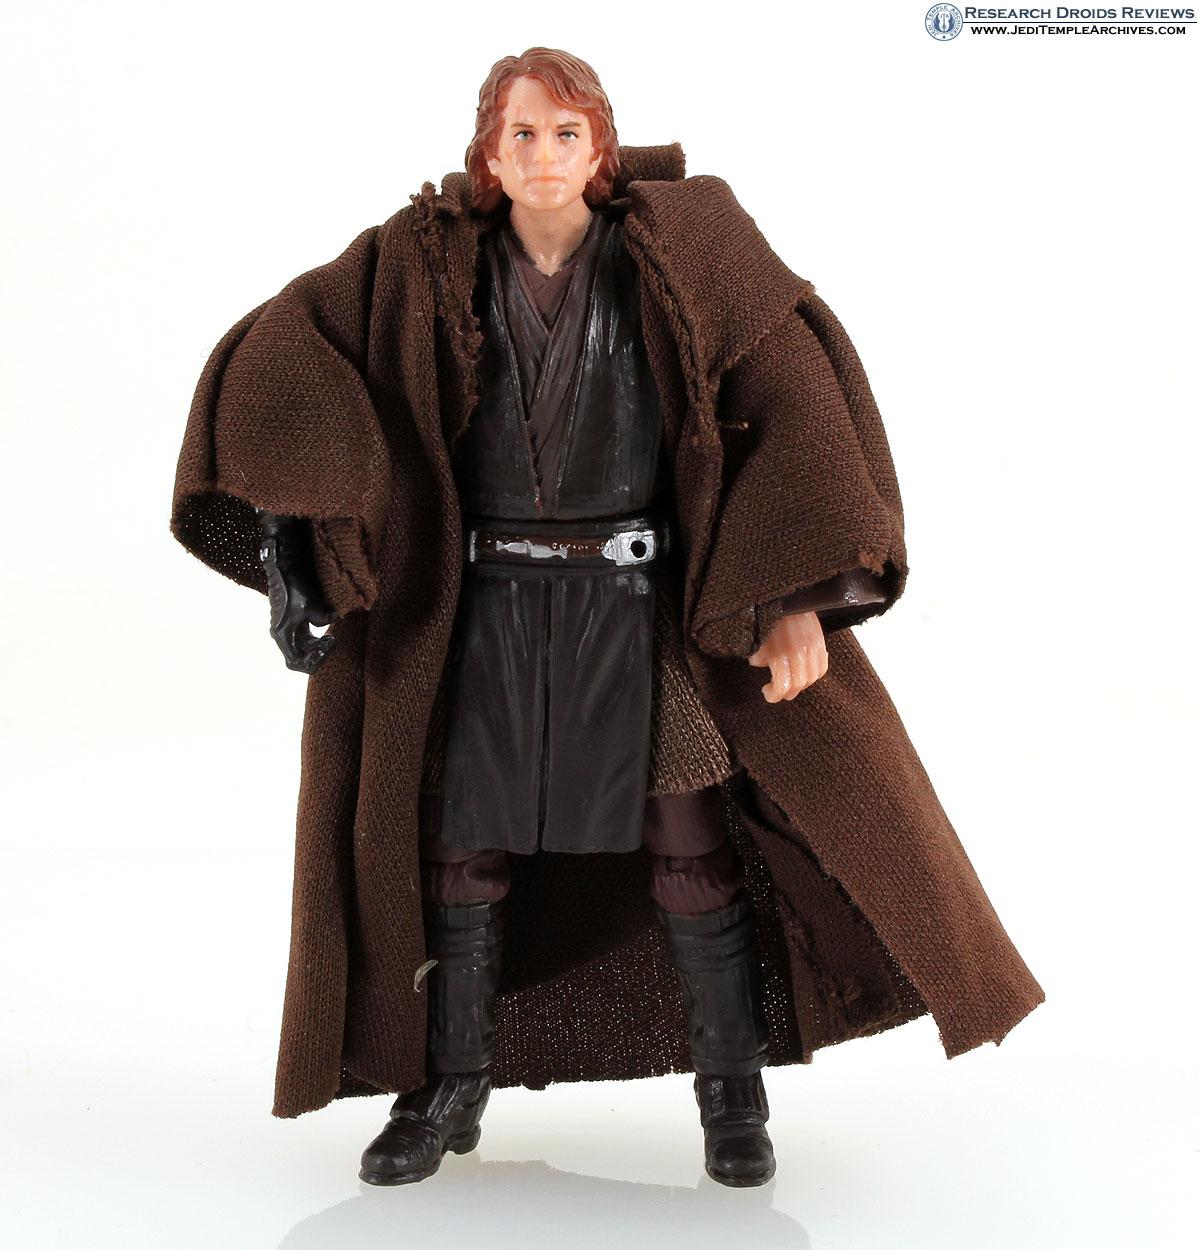 Anakin Skywalker | Episode III